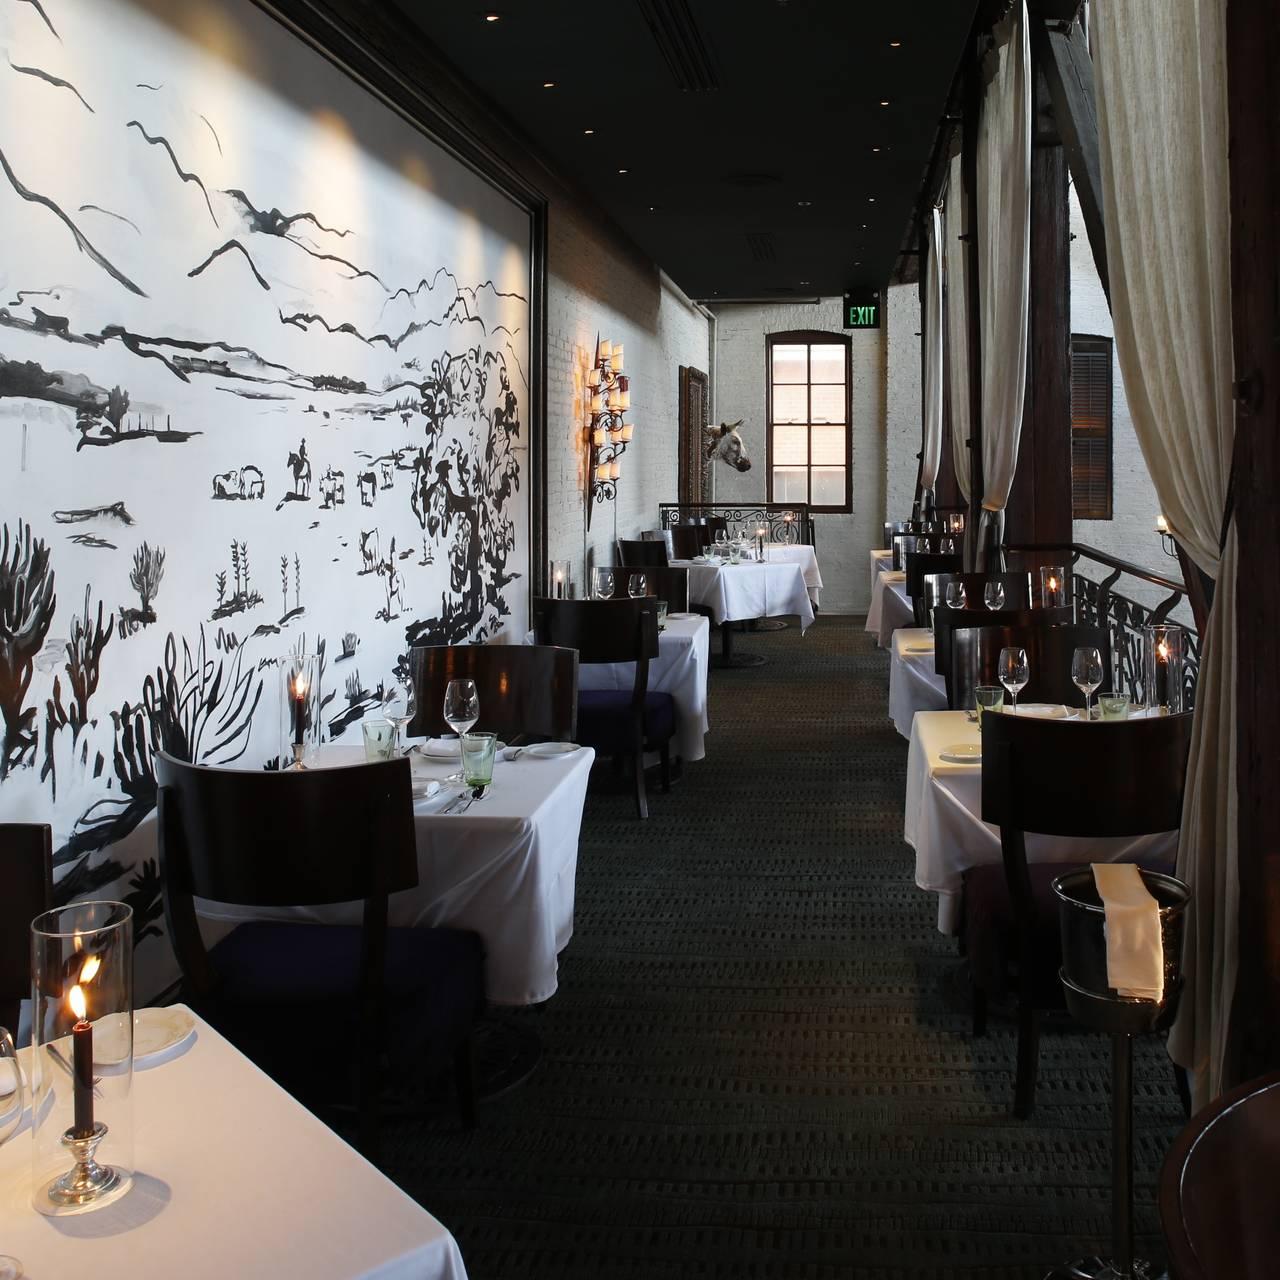 Bar Vasquez Restaurant - Baltimore, MD | OpenTable